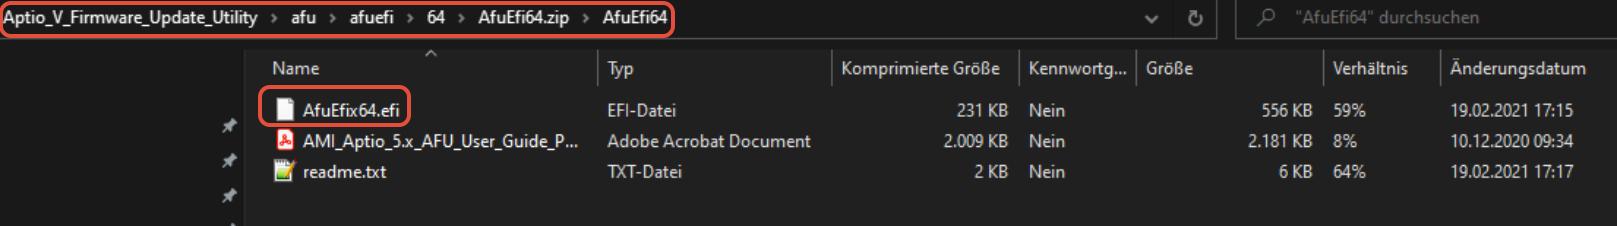 "copy this file into the ""SPI_UPD"" folder"